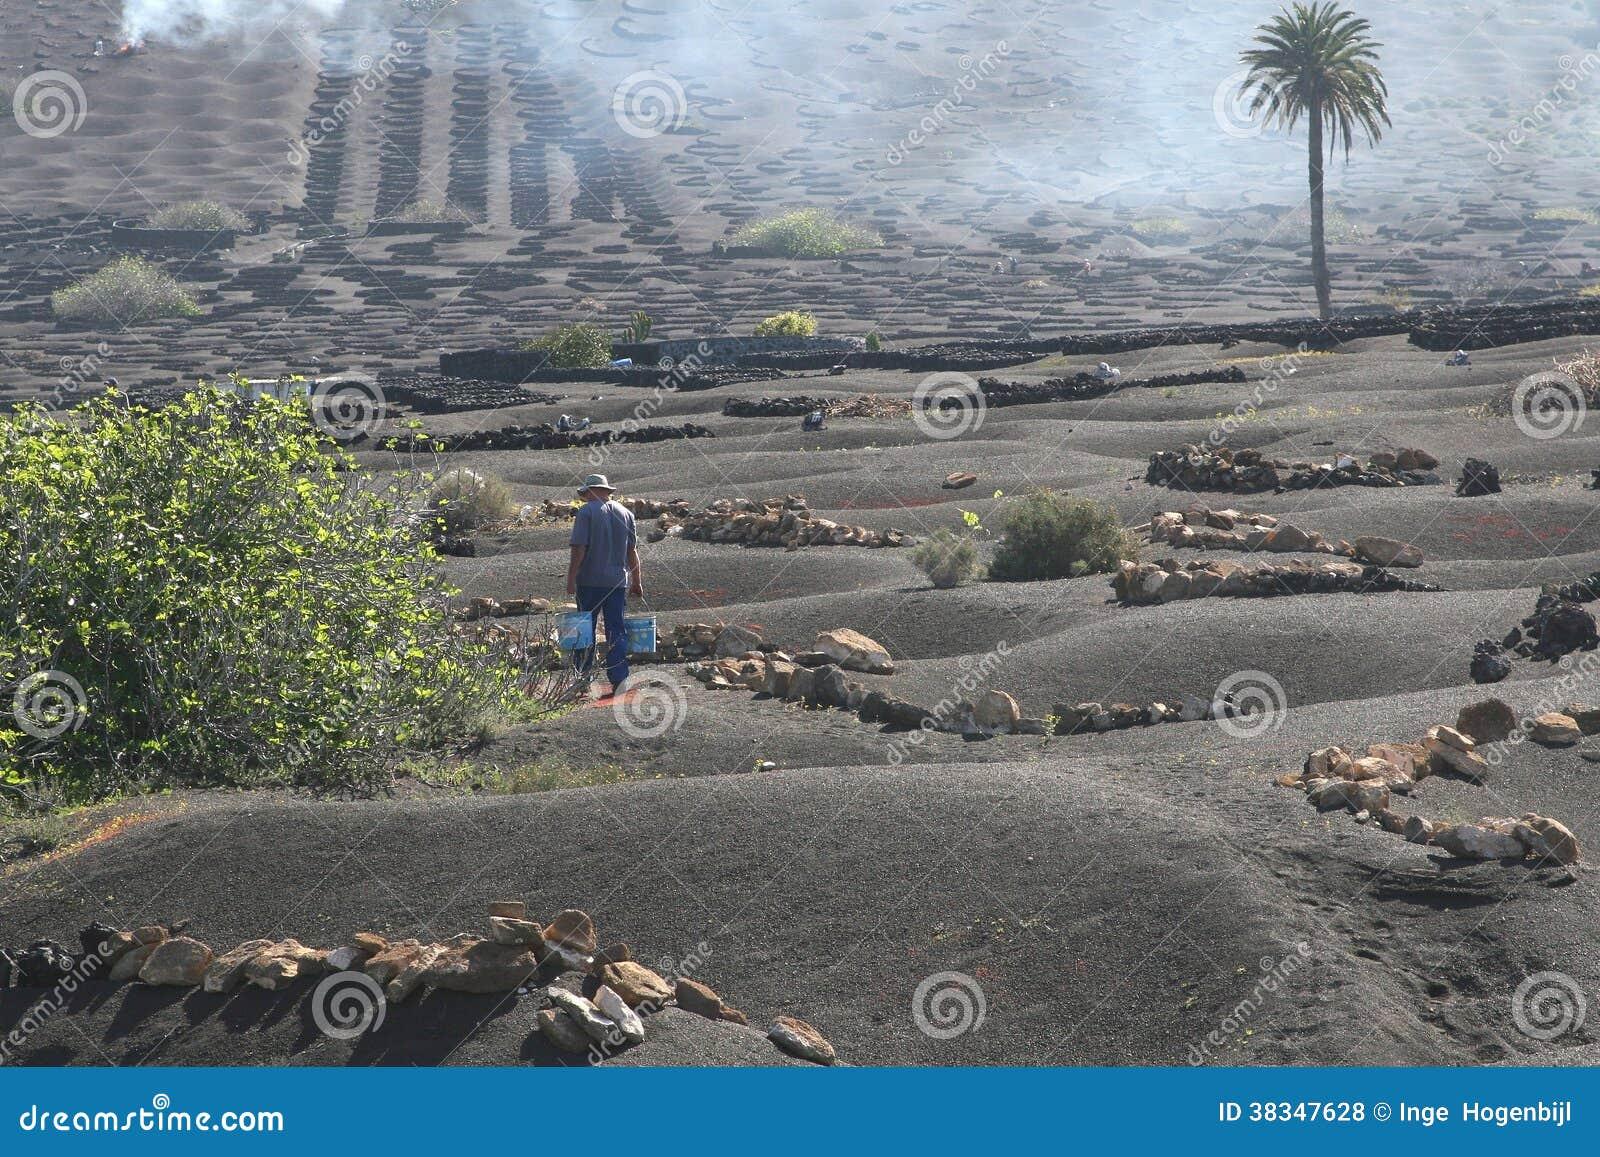 Worker is working in a vineyard in surrealis black lava fields, Lanzarote, Spain